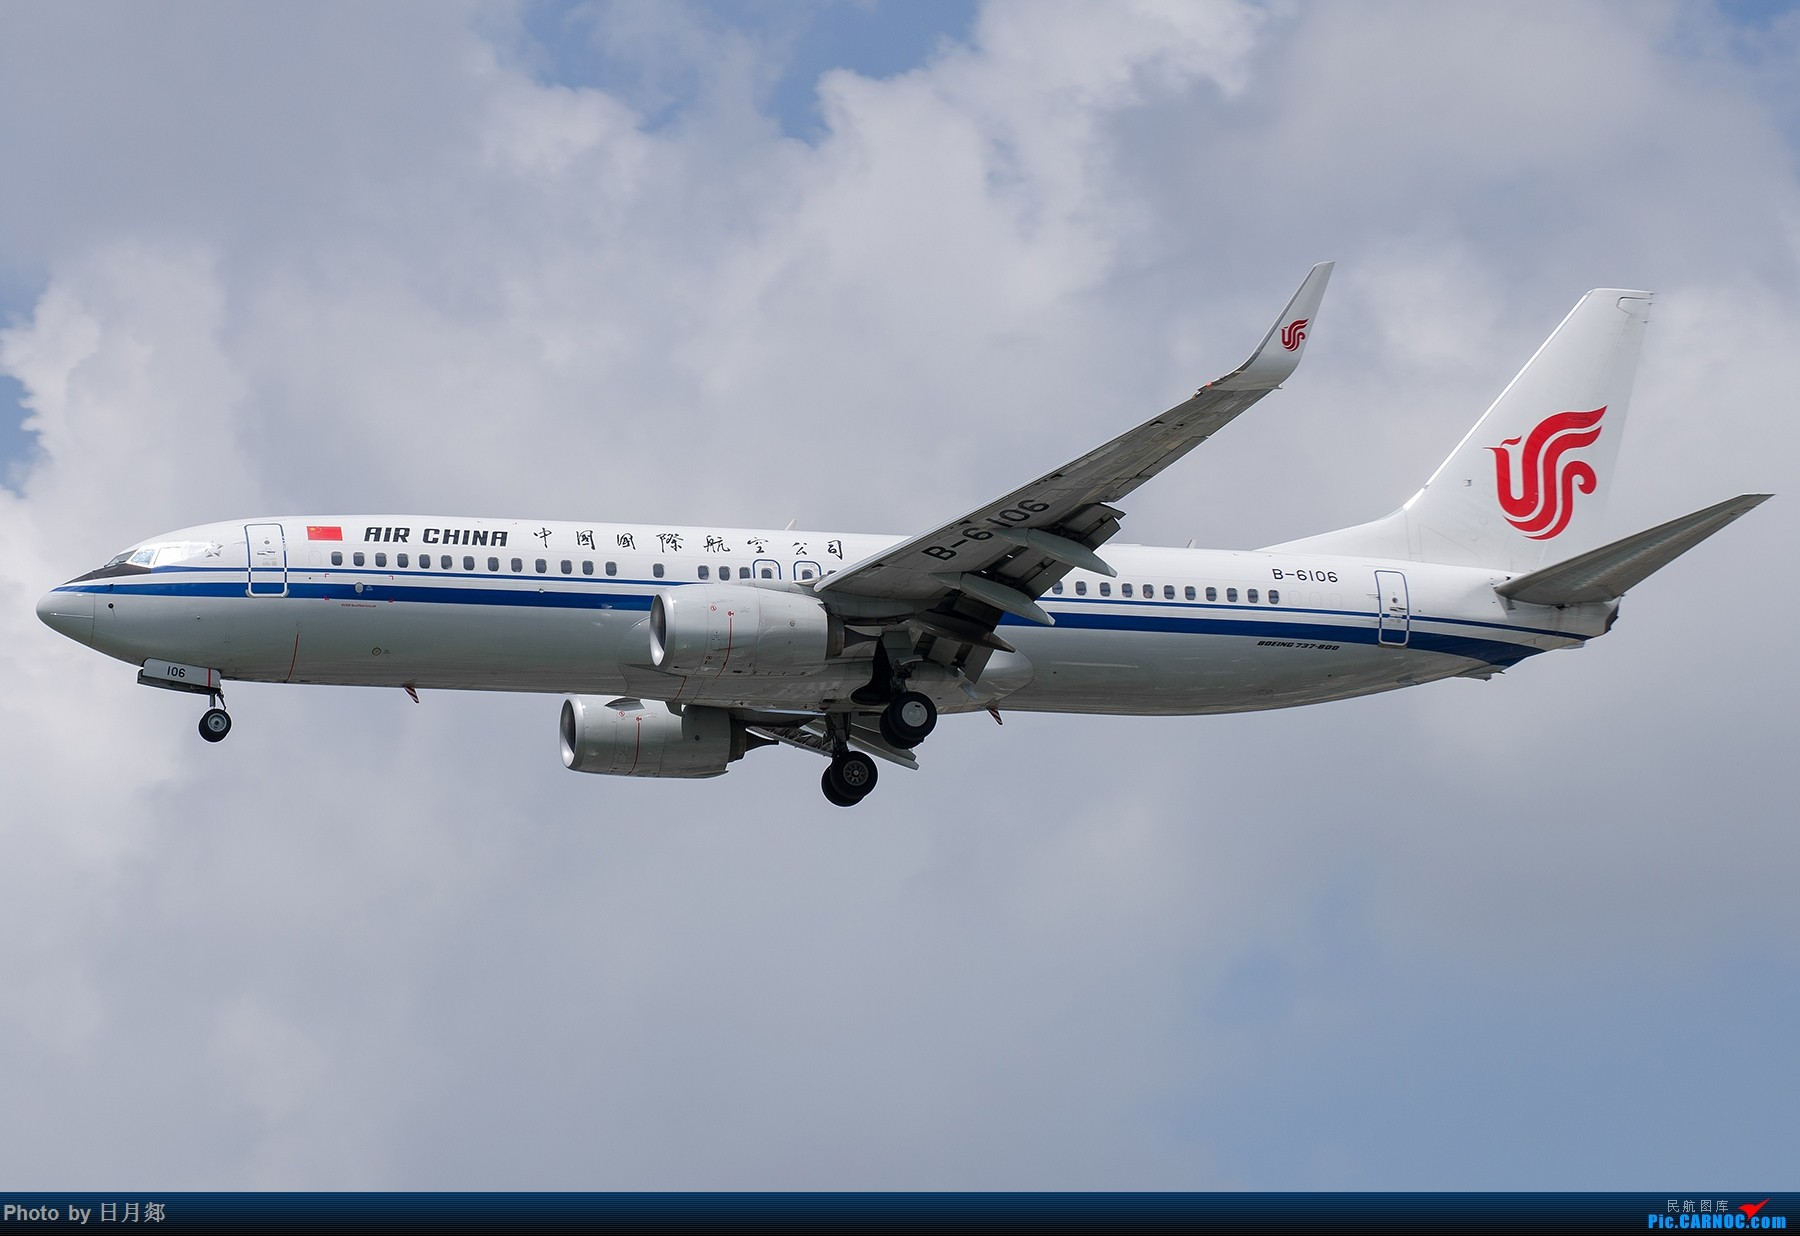 Re:[原创]【SHA拍机*1800大图】图要抓紧发,不然就要炒冷饭,大头镇贴 BOEING 737-800 B-6106 中国上海虹桥国际机场